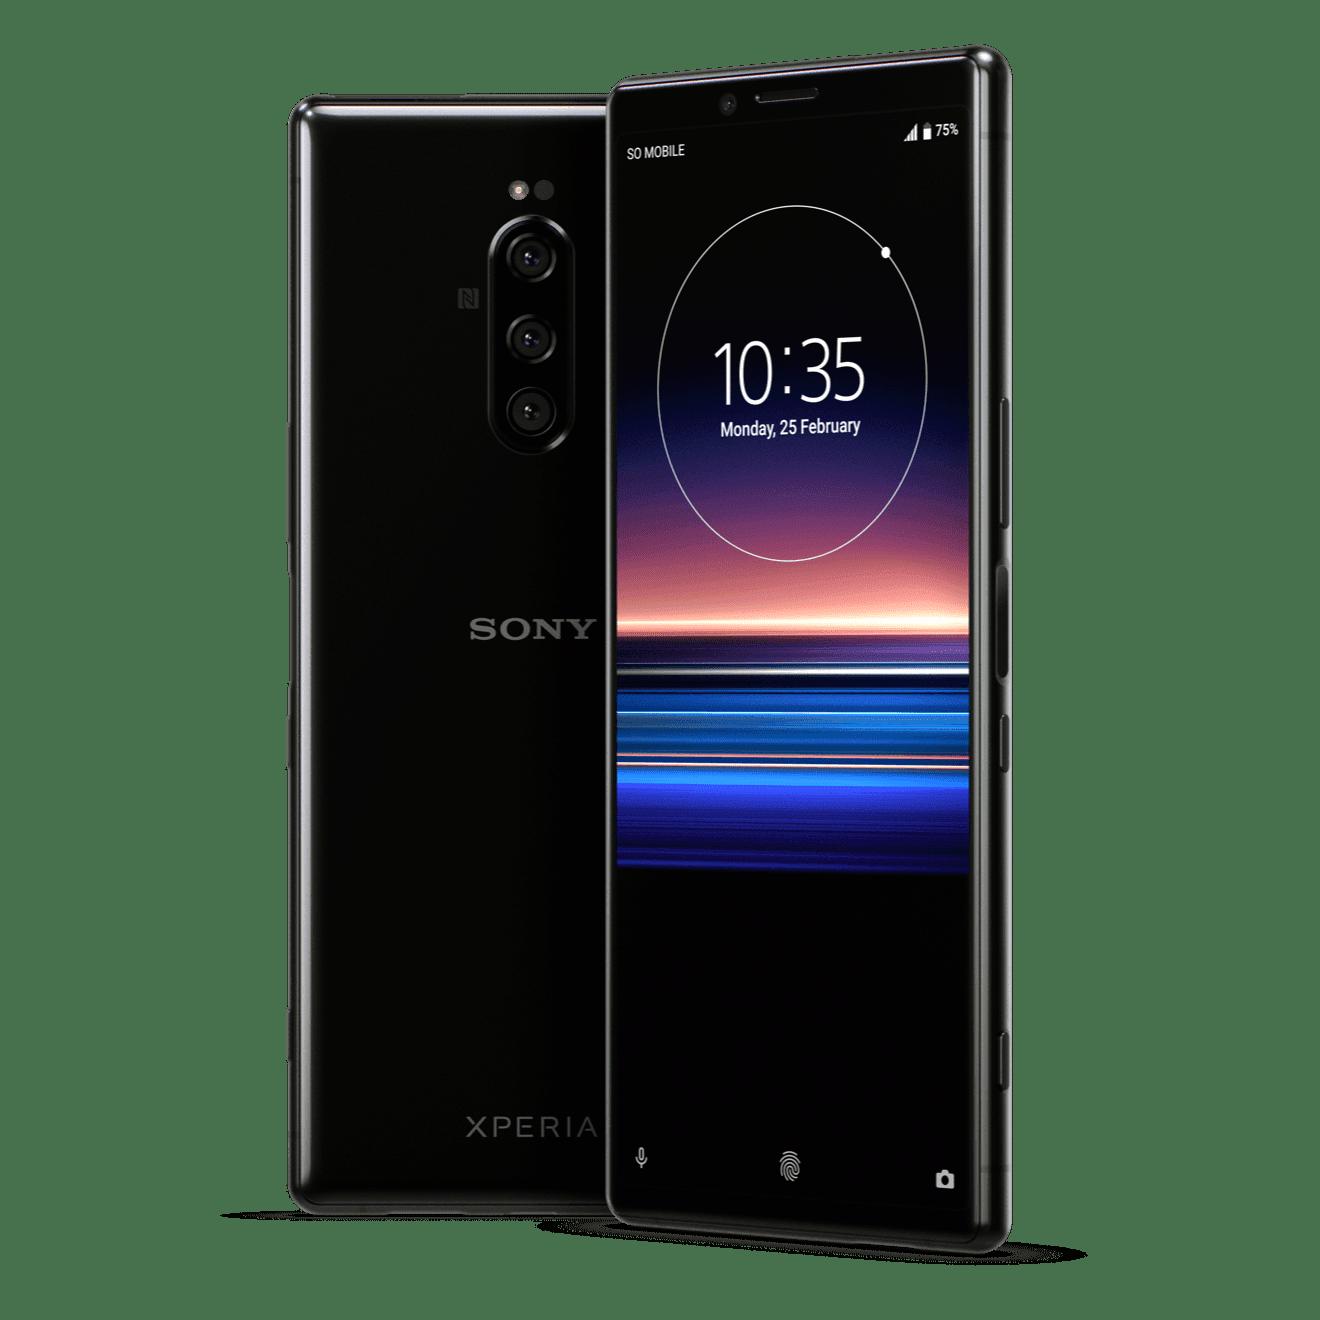 Компания Sony представила смартфон Sony Xperia 1 Professional Edition (01 xperia 1 primary product image black e776e241f1d48b55ad6e630f862253b6)